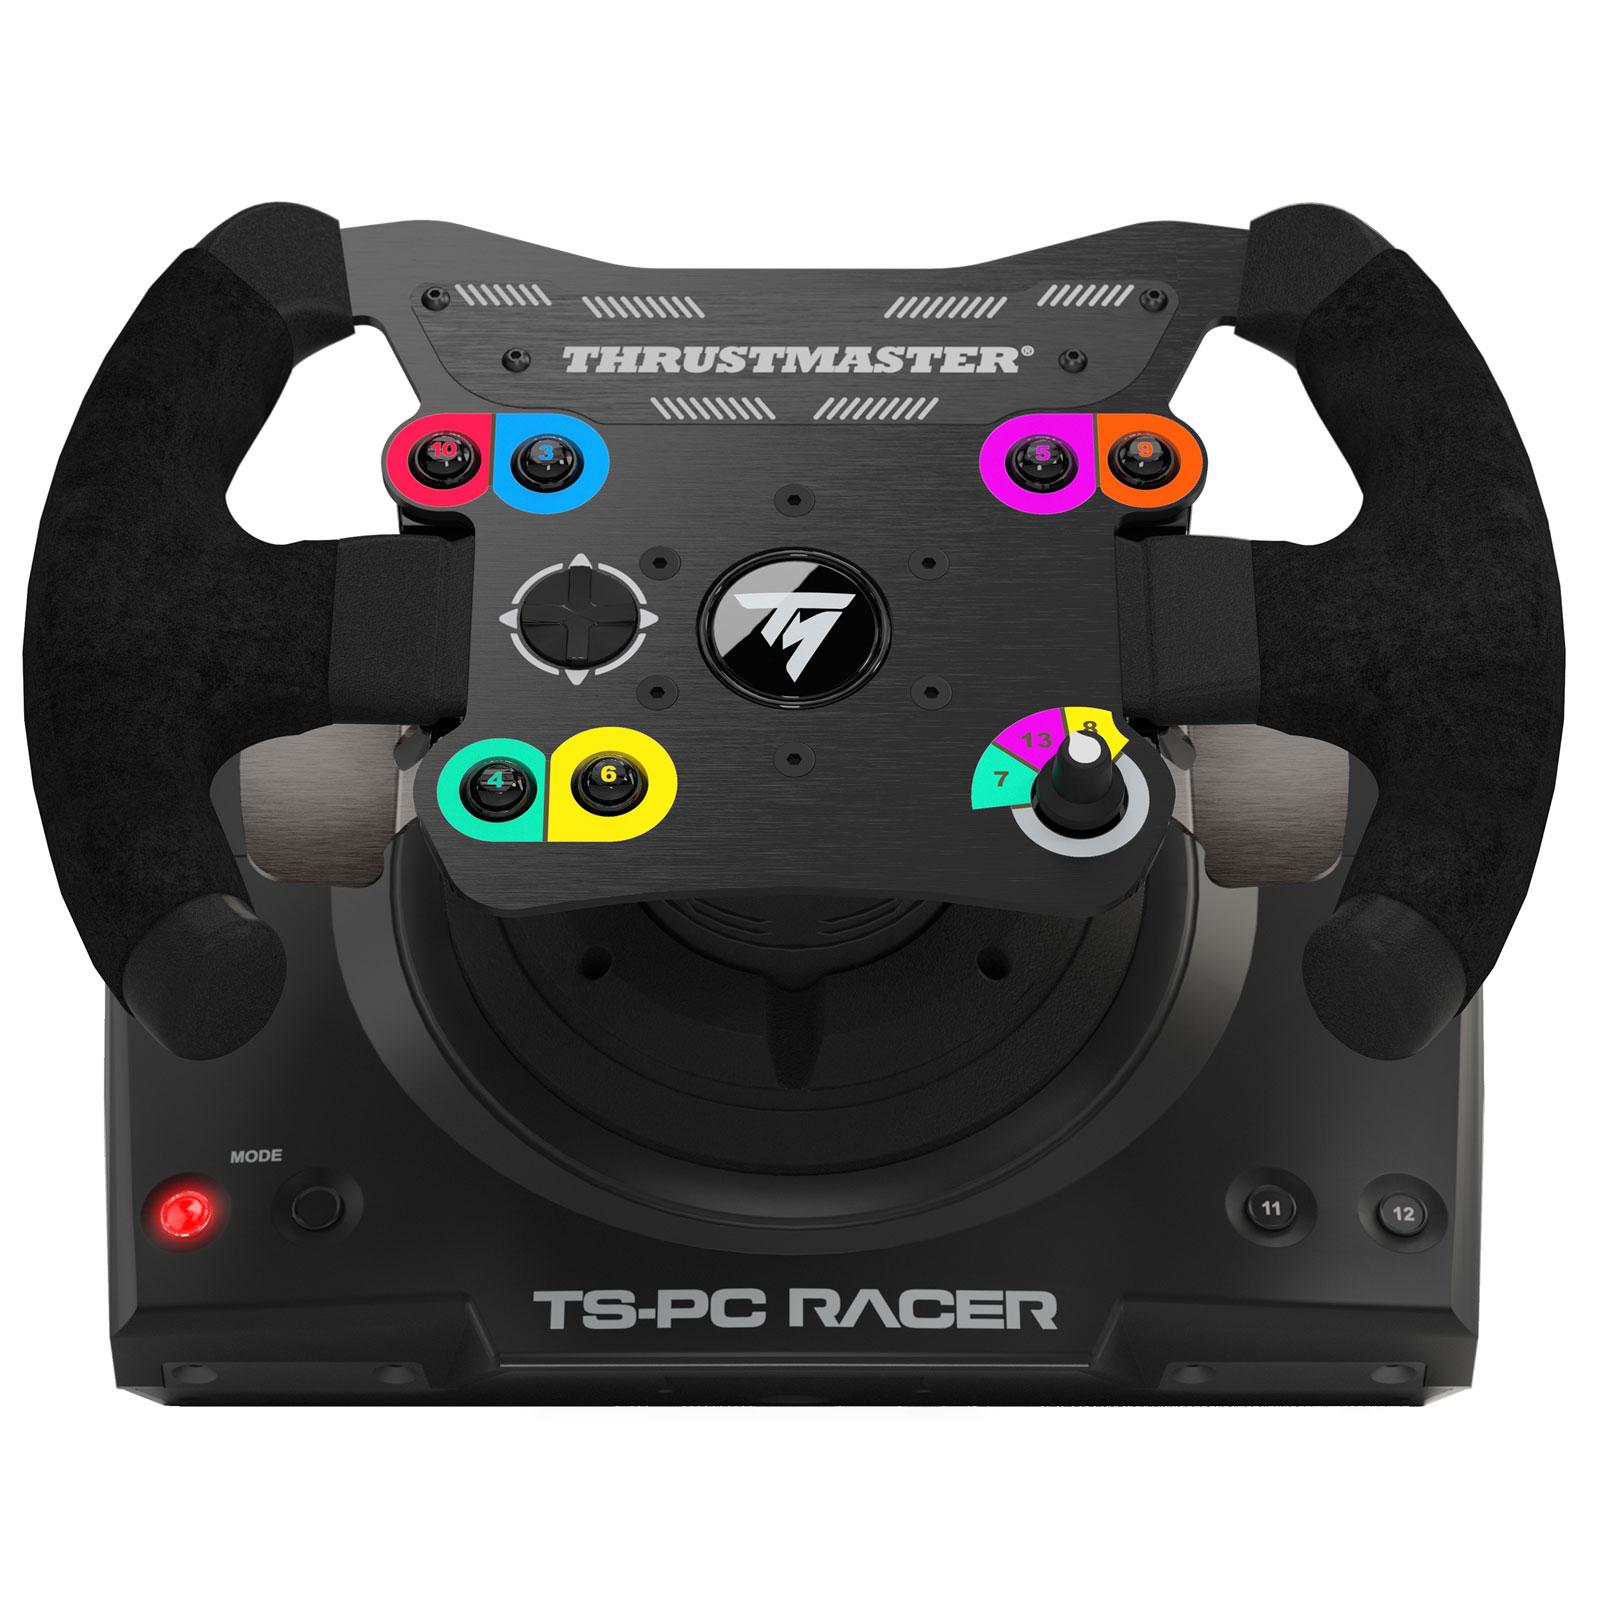 ThrustMaster TS-PC Racer - Périphérique de jeu - Cybertek.fr - 1